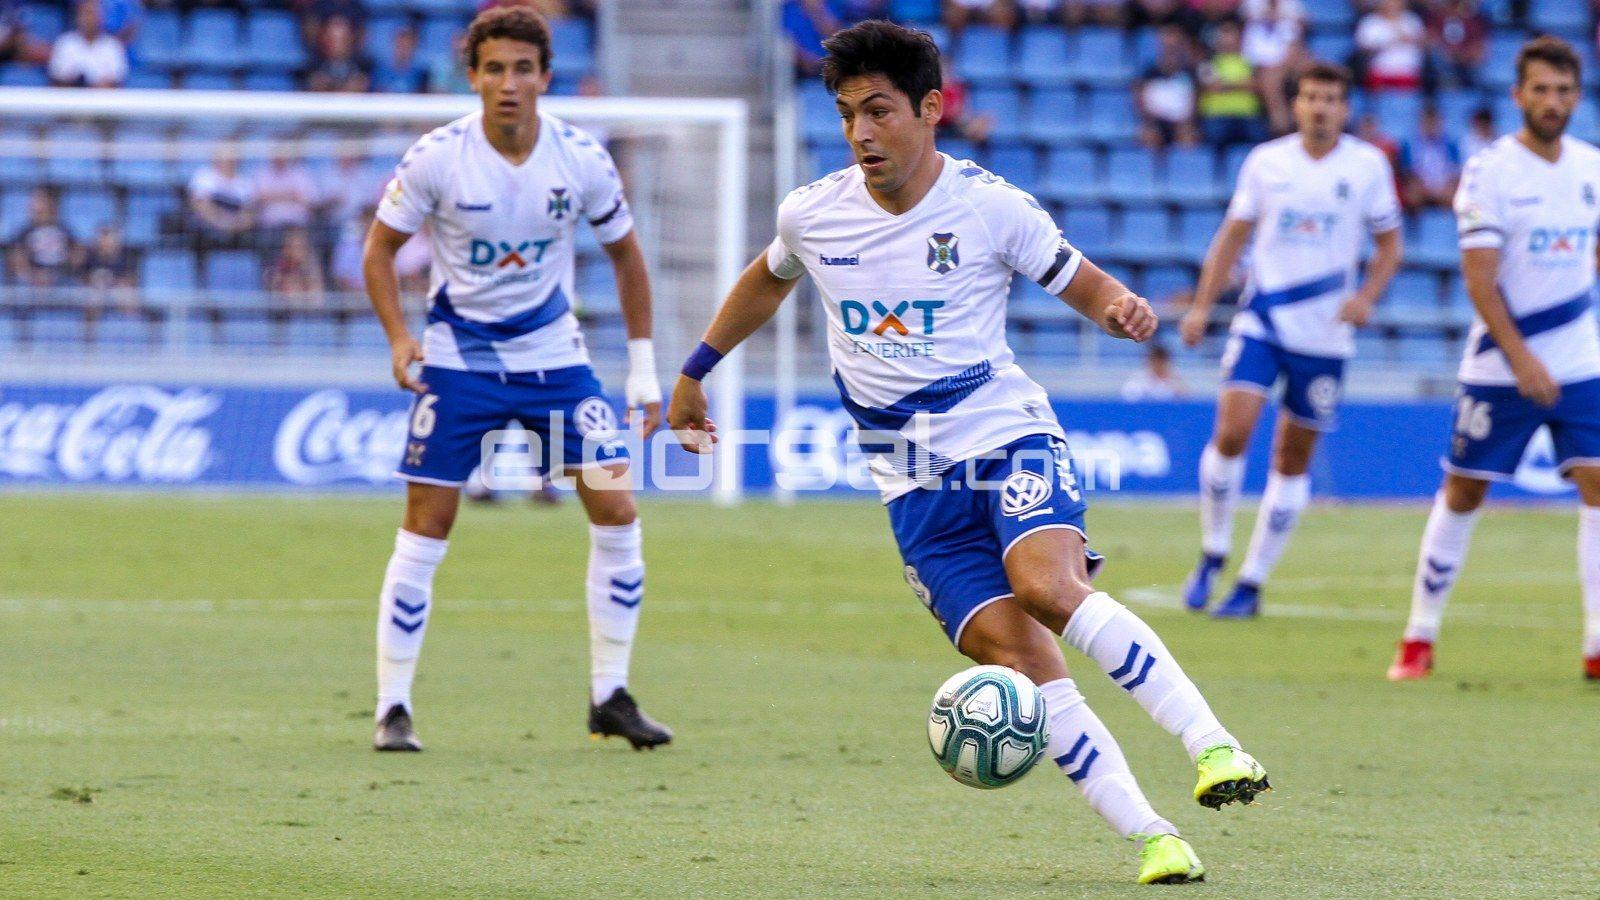 Borja Lasso CD TENERIFE - FUENLABRADA